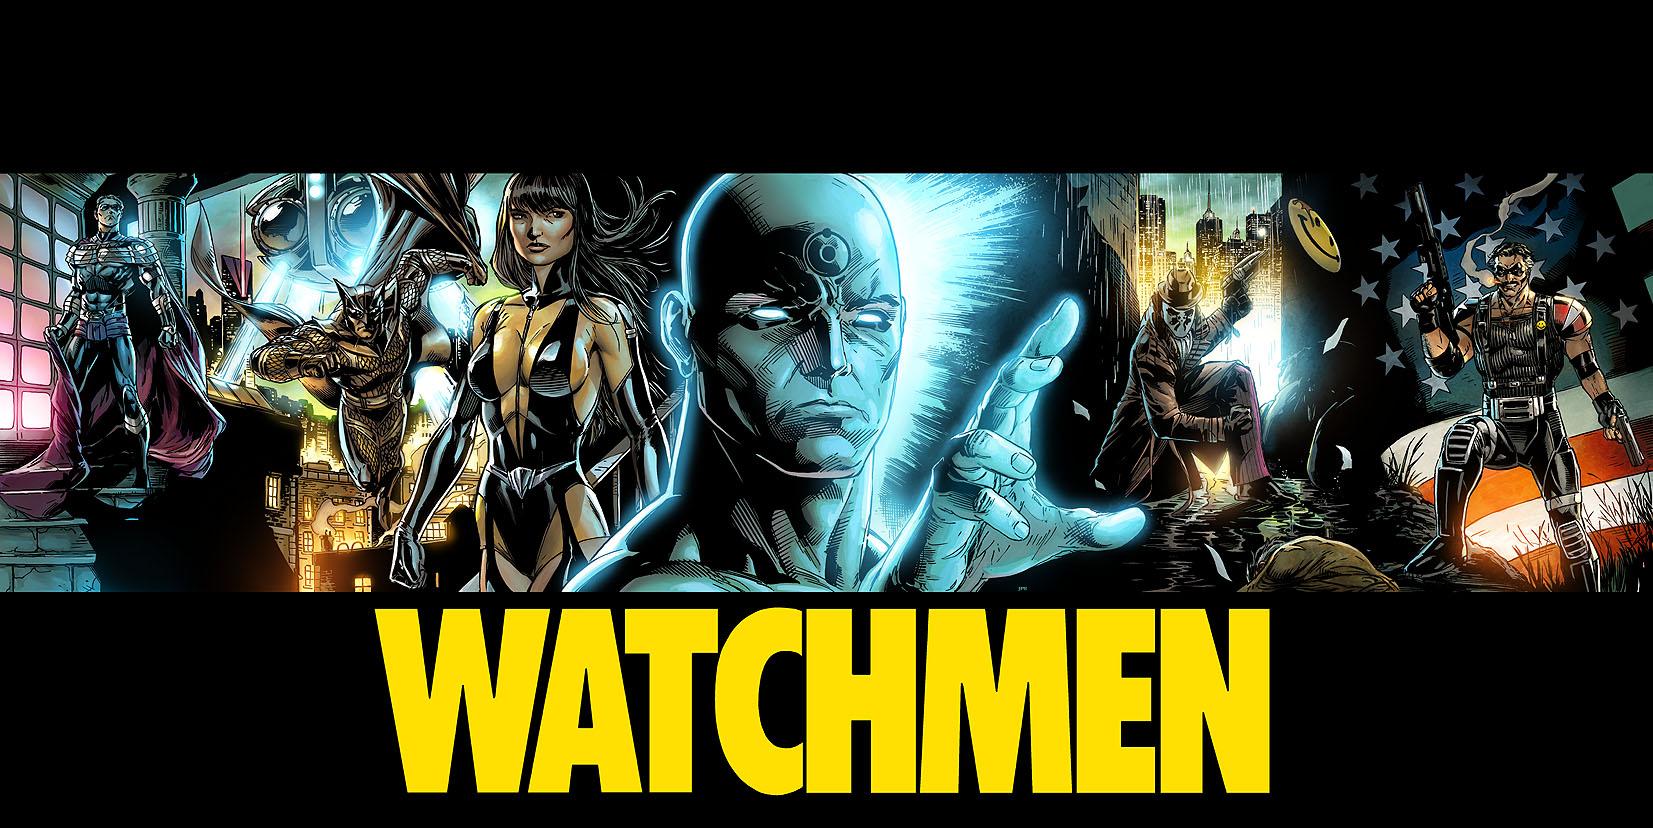 Watchmen_Color_by_JPRart-2